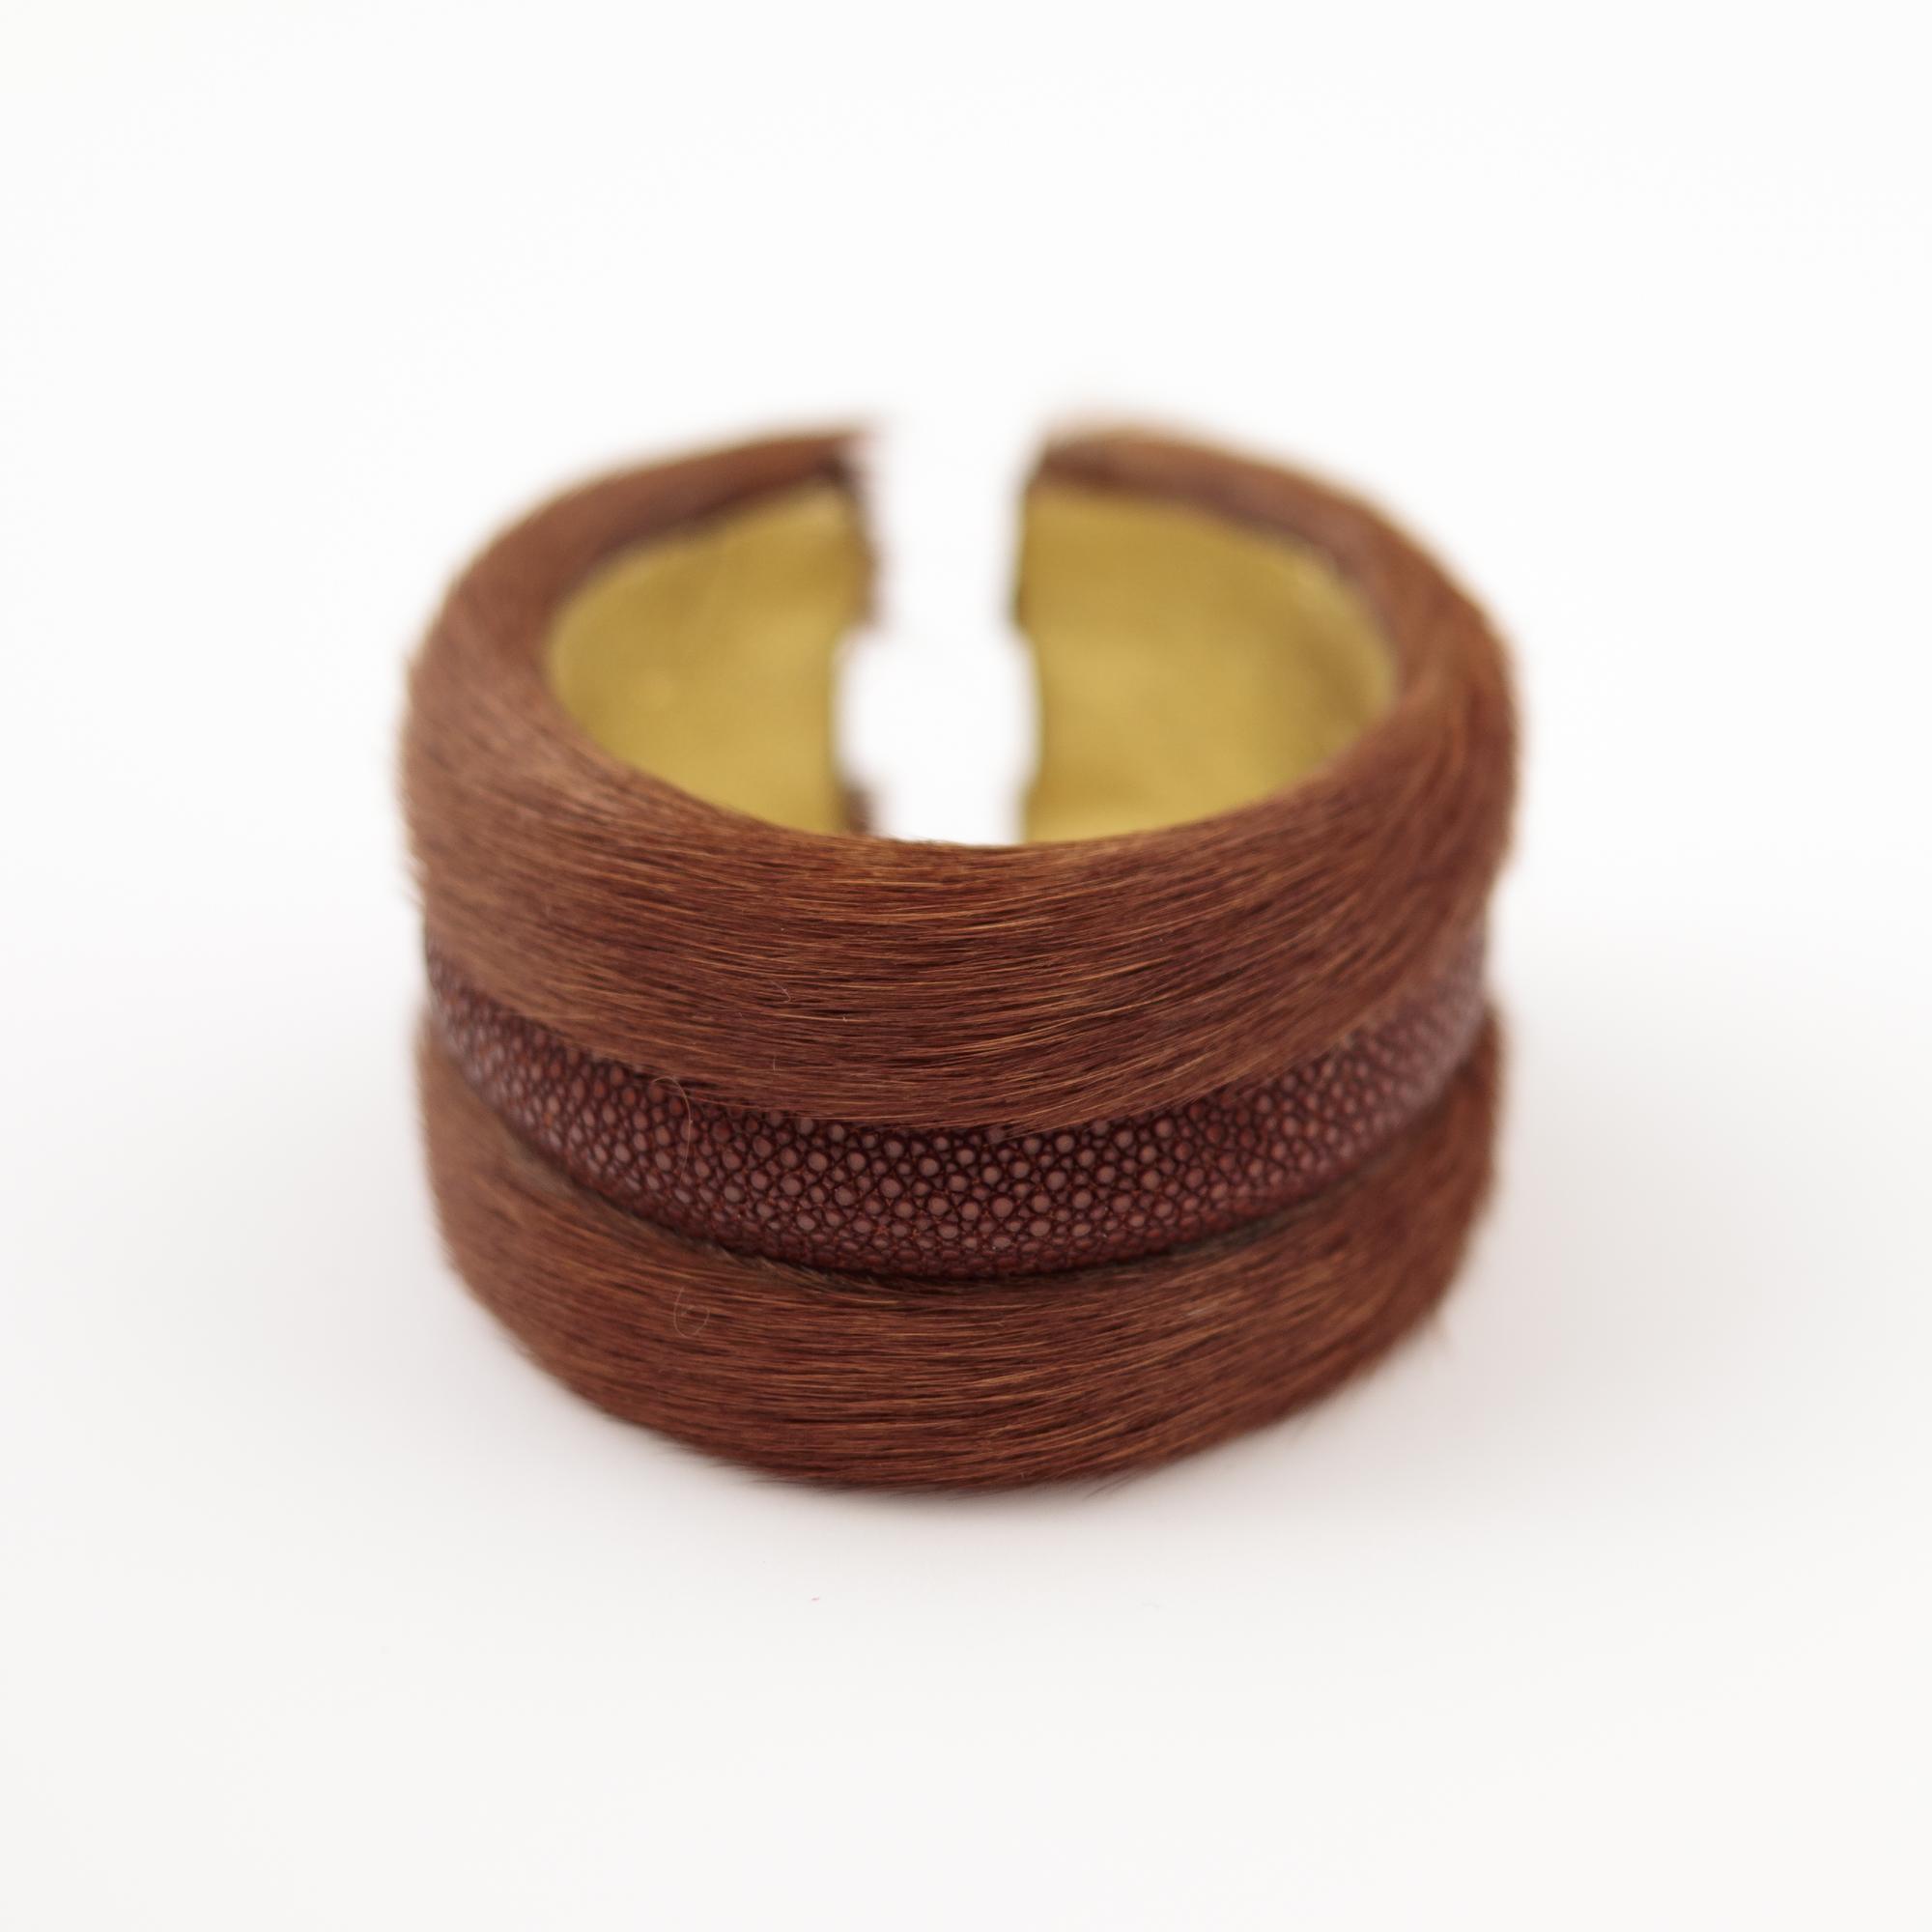 tresor-by-flore-galuchat-bracelet-poilu-marron-caramel